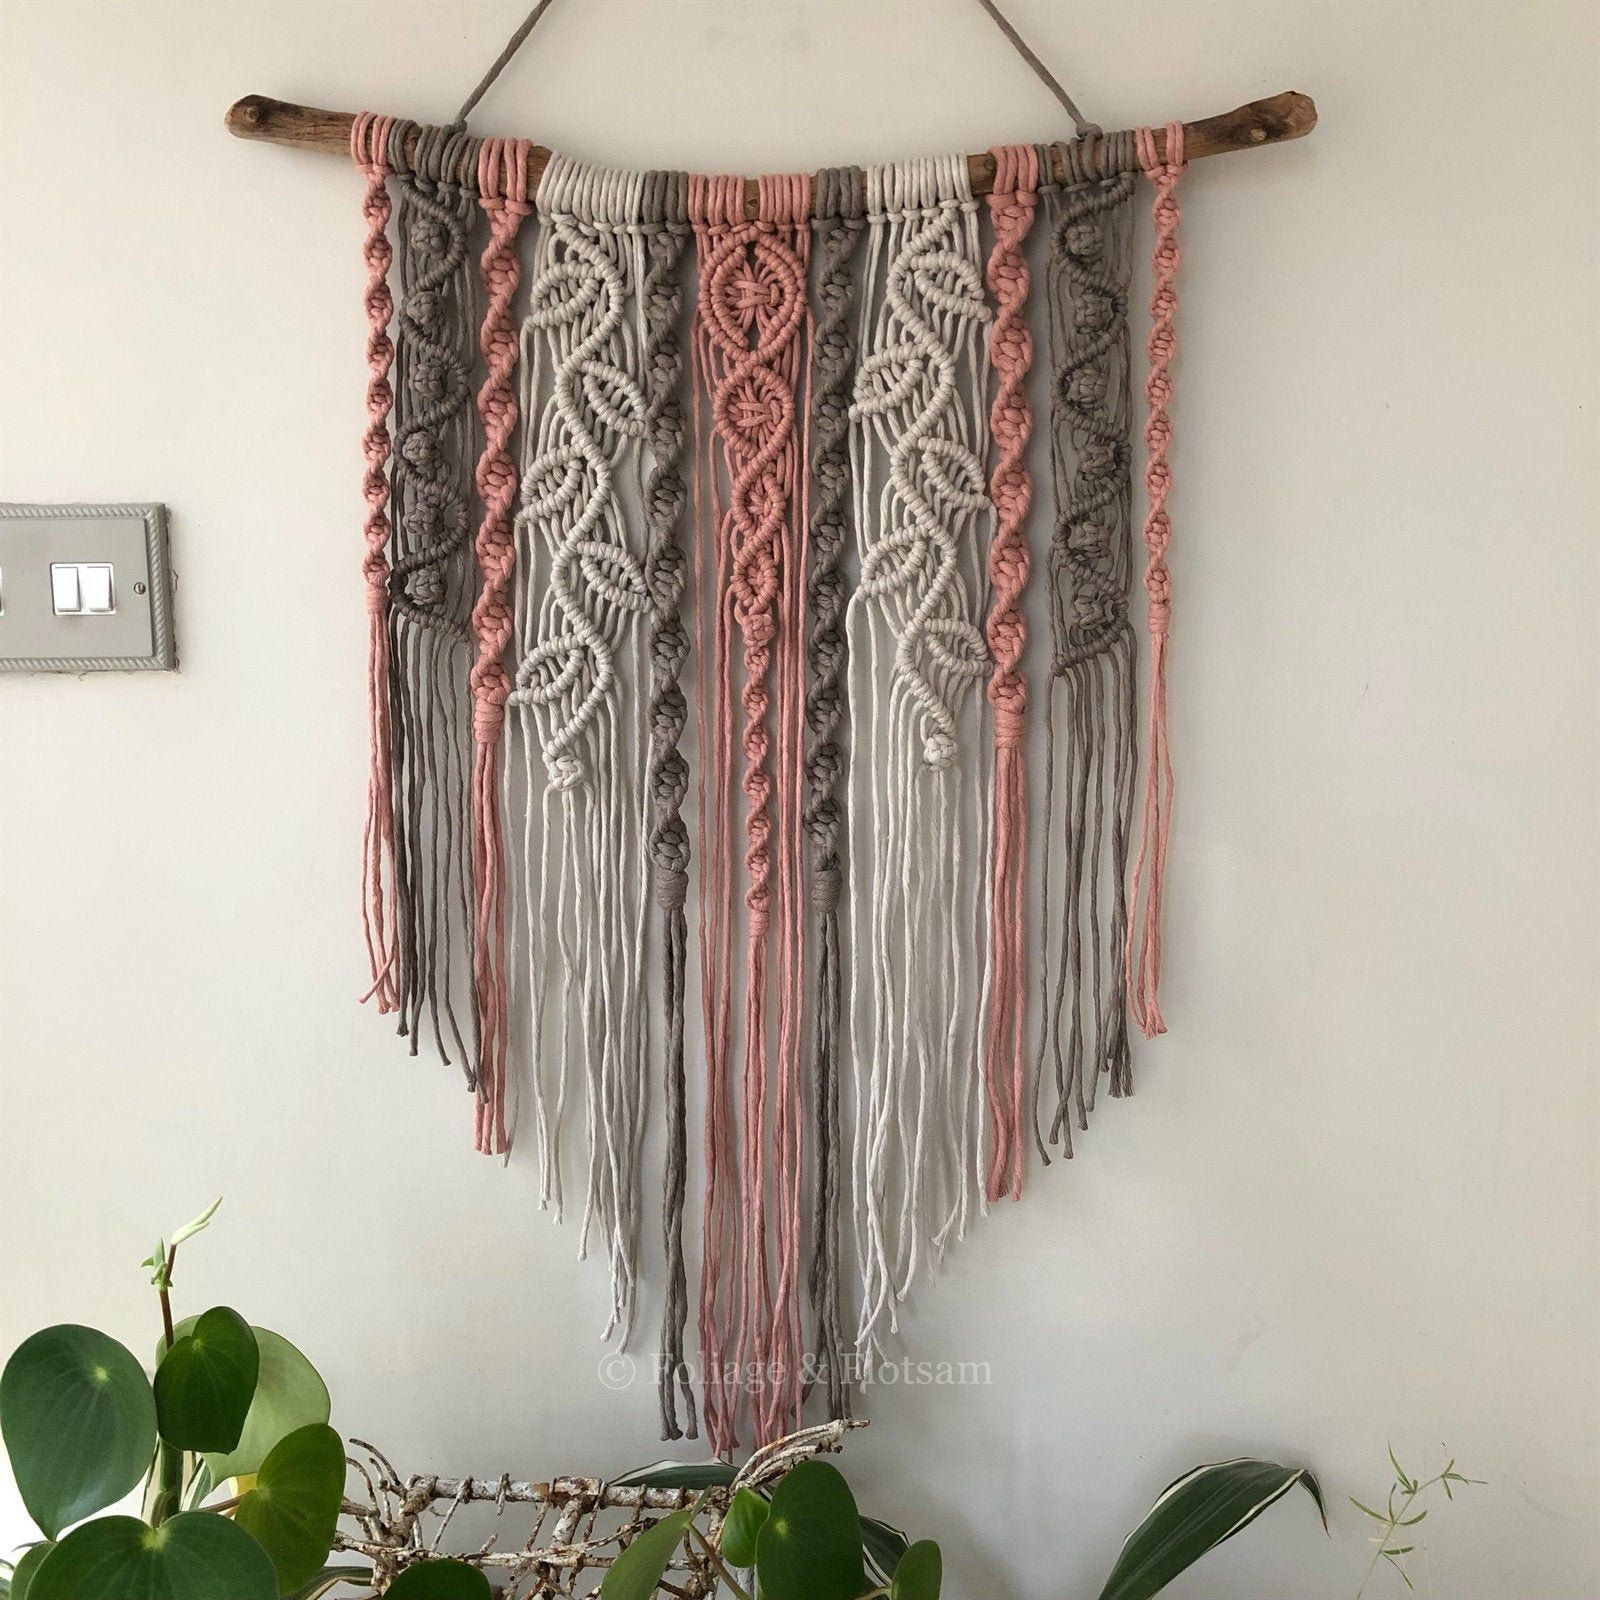 Large coloured macrame wall hanging, nursery Scandi style wall decor, boho interiors, woven leaves, bohemian living